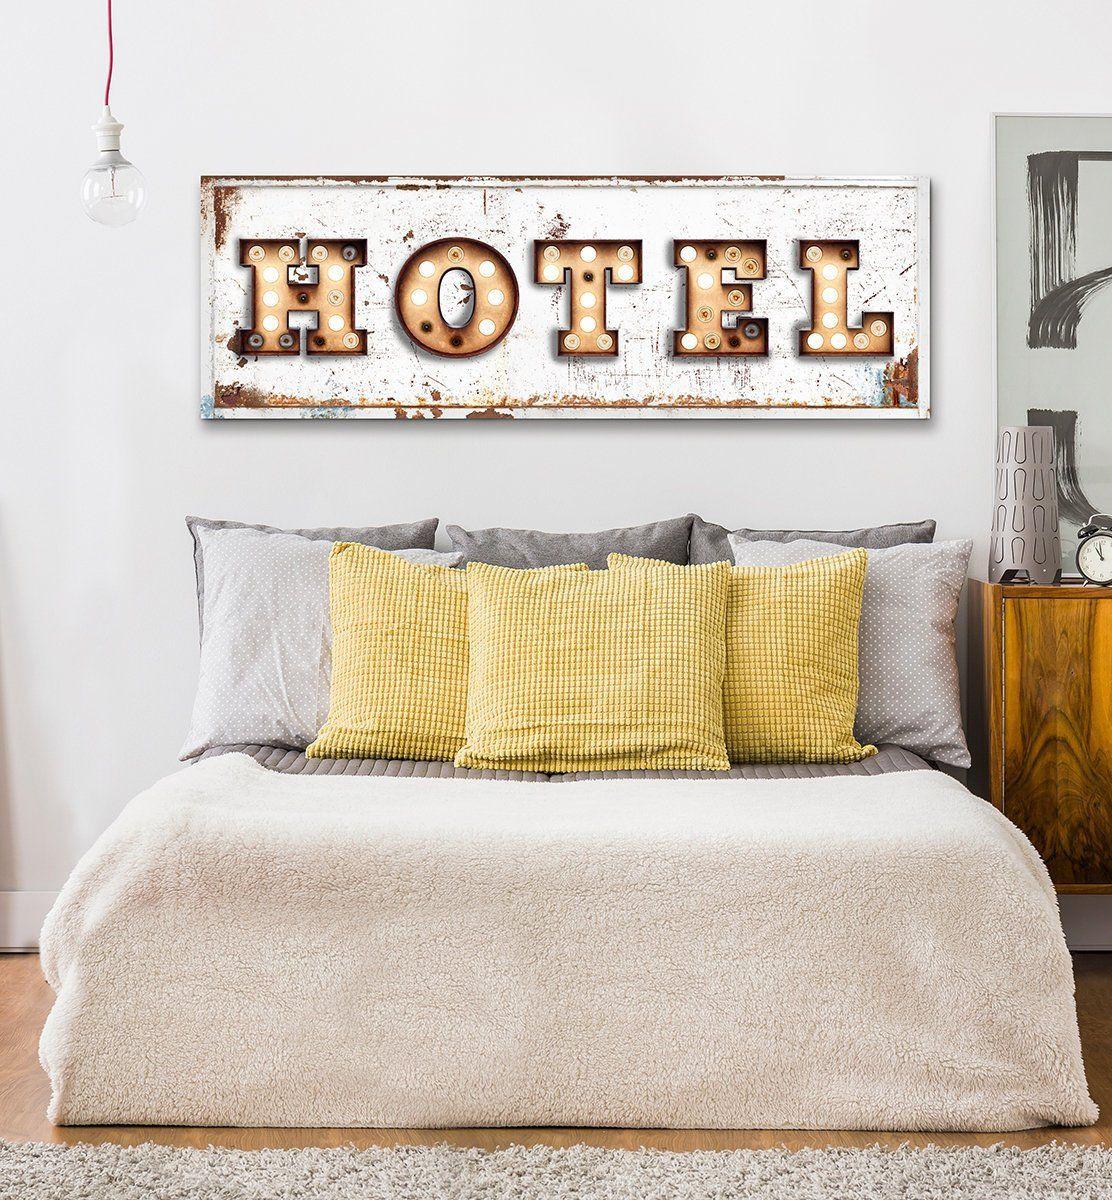 Hotel Sign Vintage Farmhouse Wall Decor Bedroom Wall Art Rustic